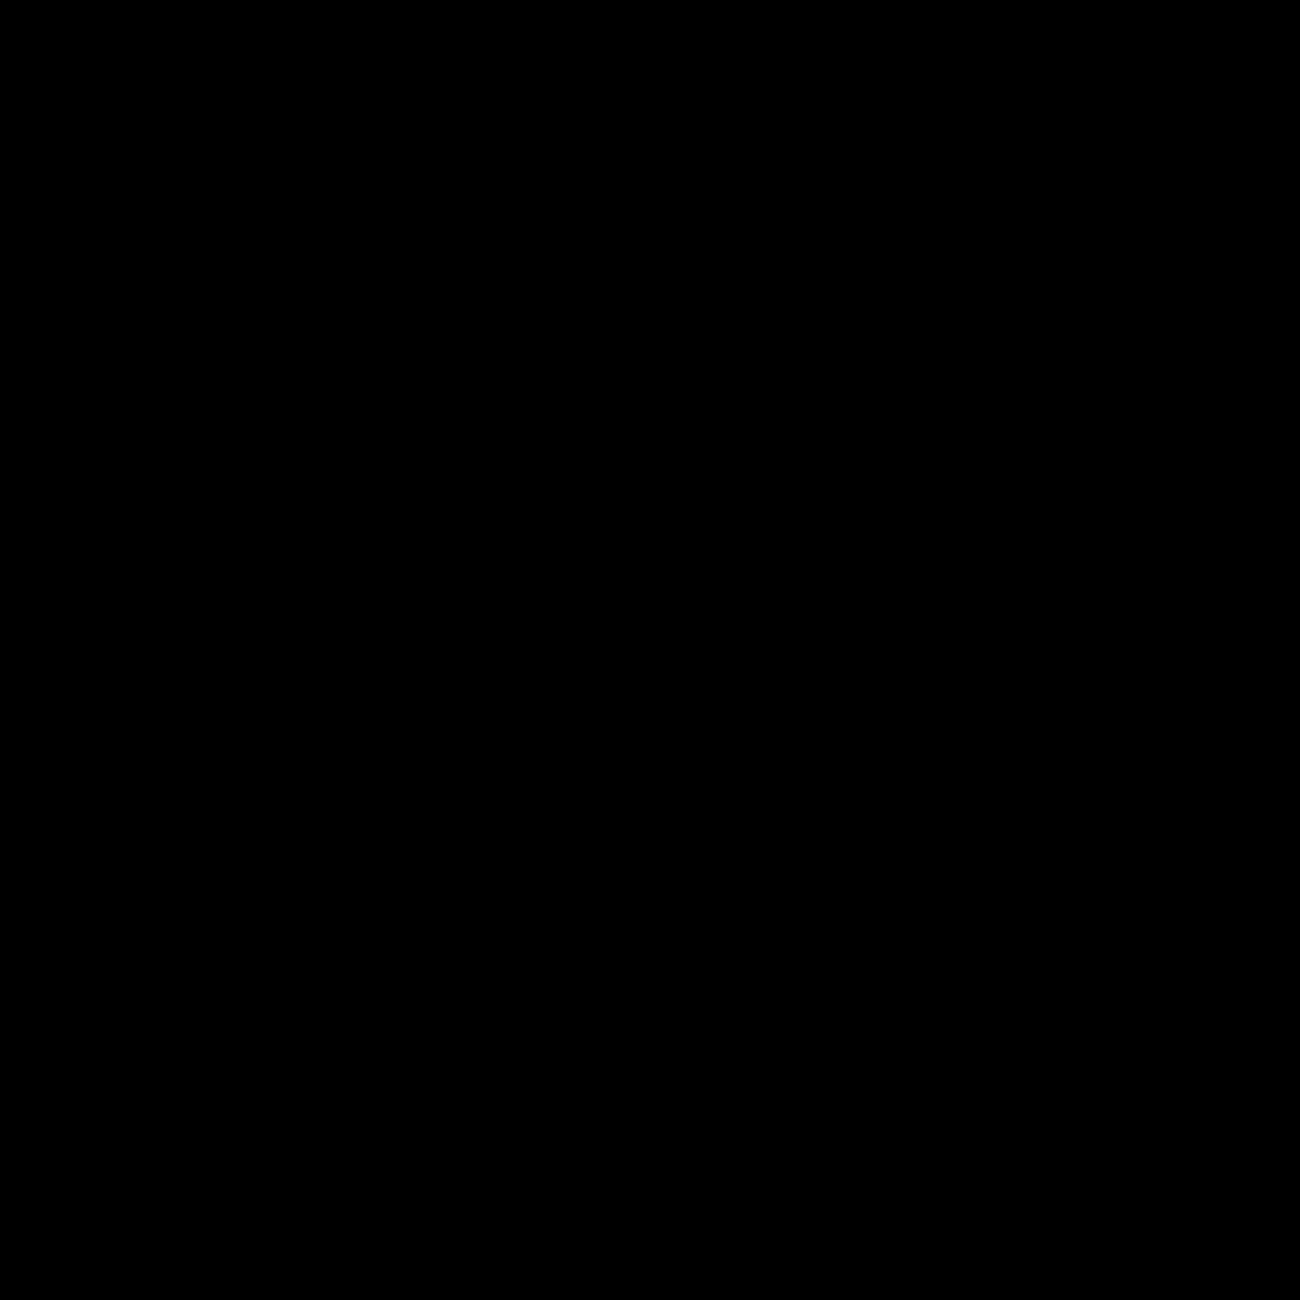 166098